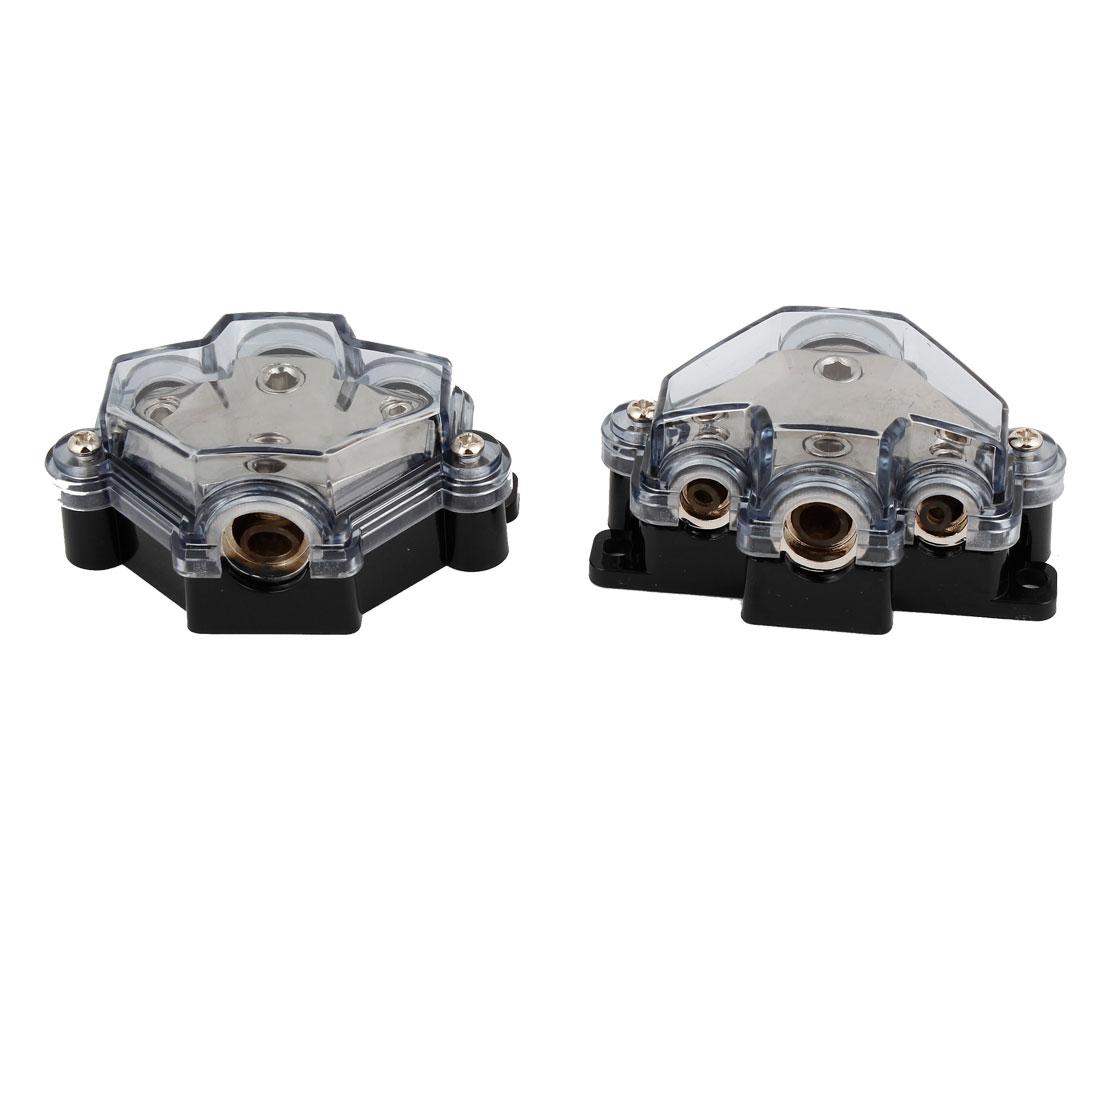 Black Gray Car Audio Amplifier 1 in 3 Power Distributor Block Fuse Holder